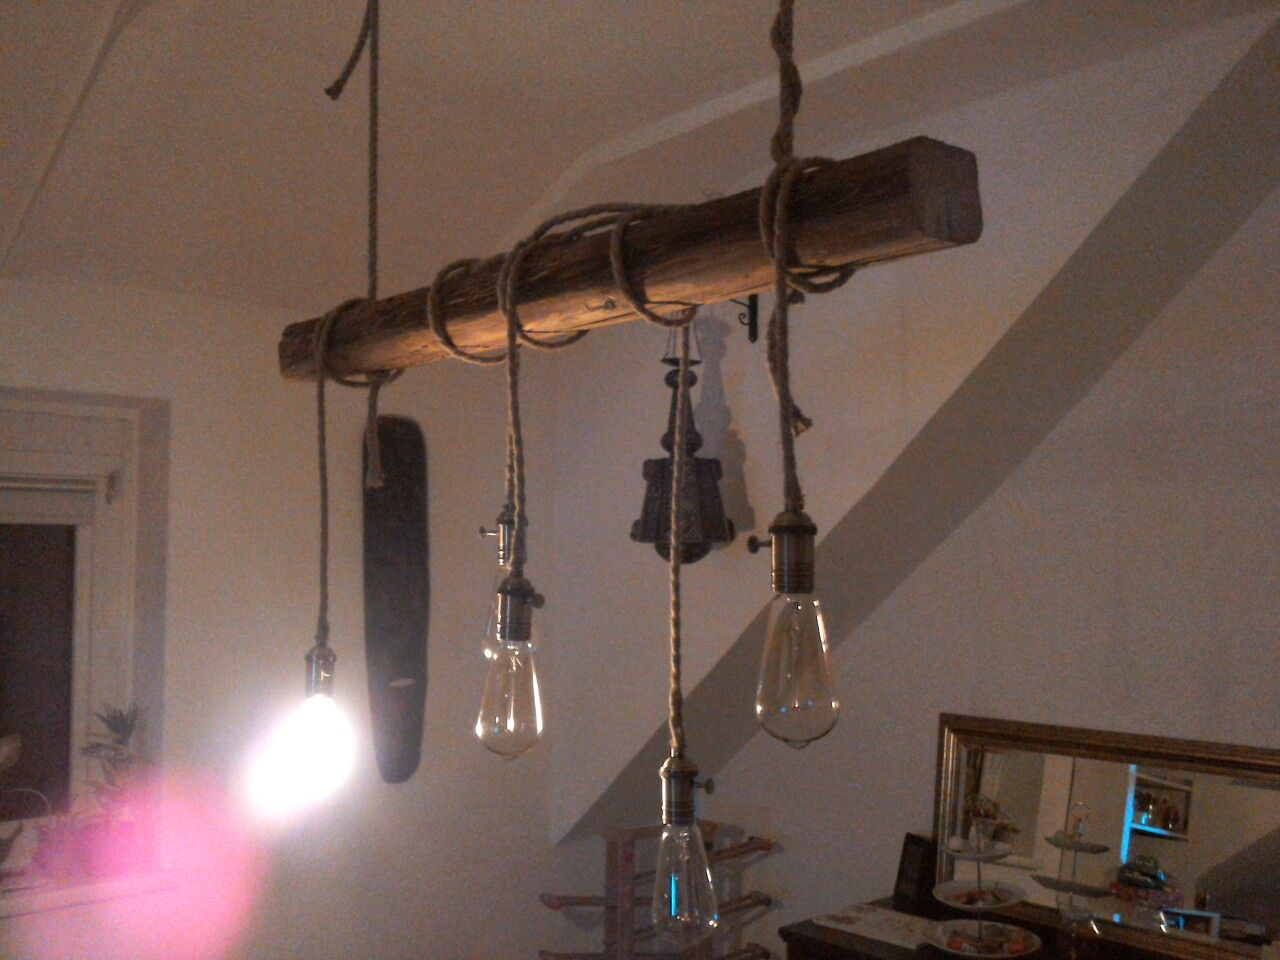 Diy Balkenlampe Alter Balken Edison Gluhbirnen Textilkabel